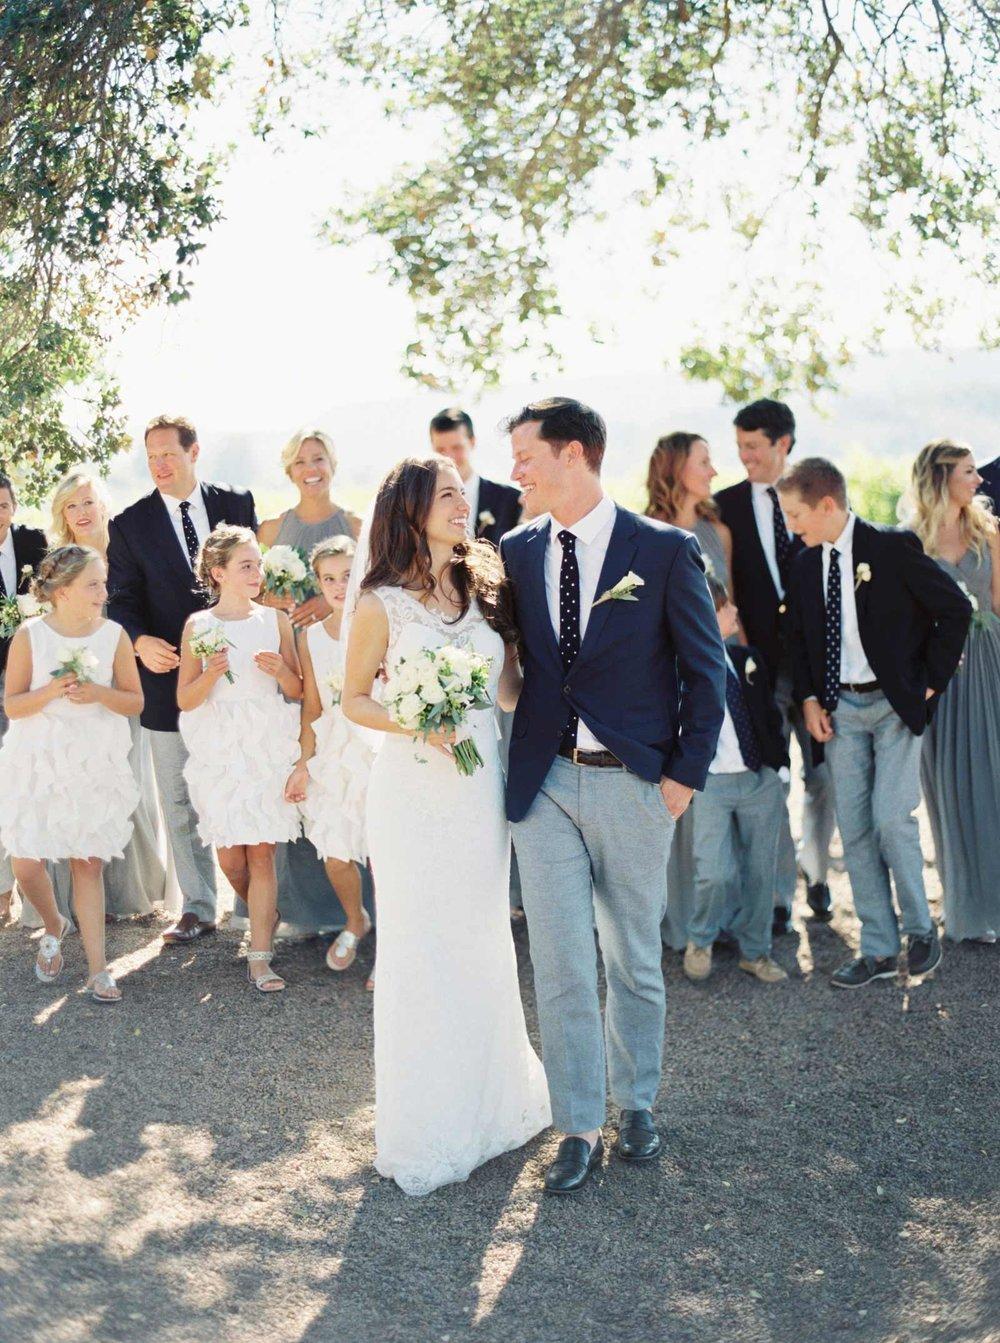 Napa-wedding-Kunde-winery-037.jpg